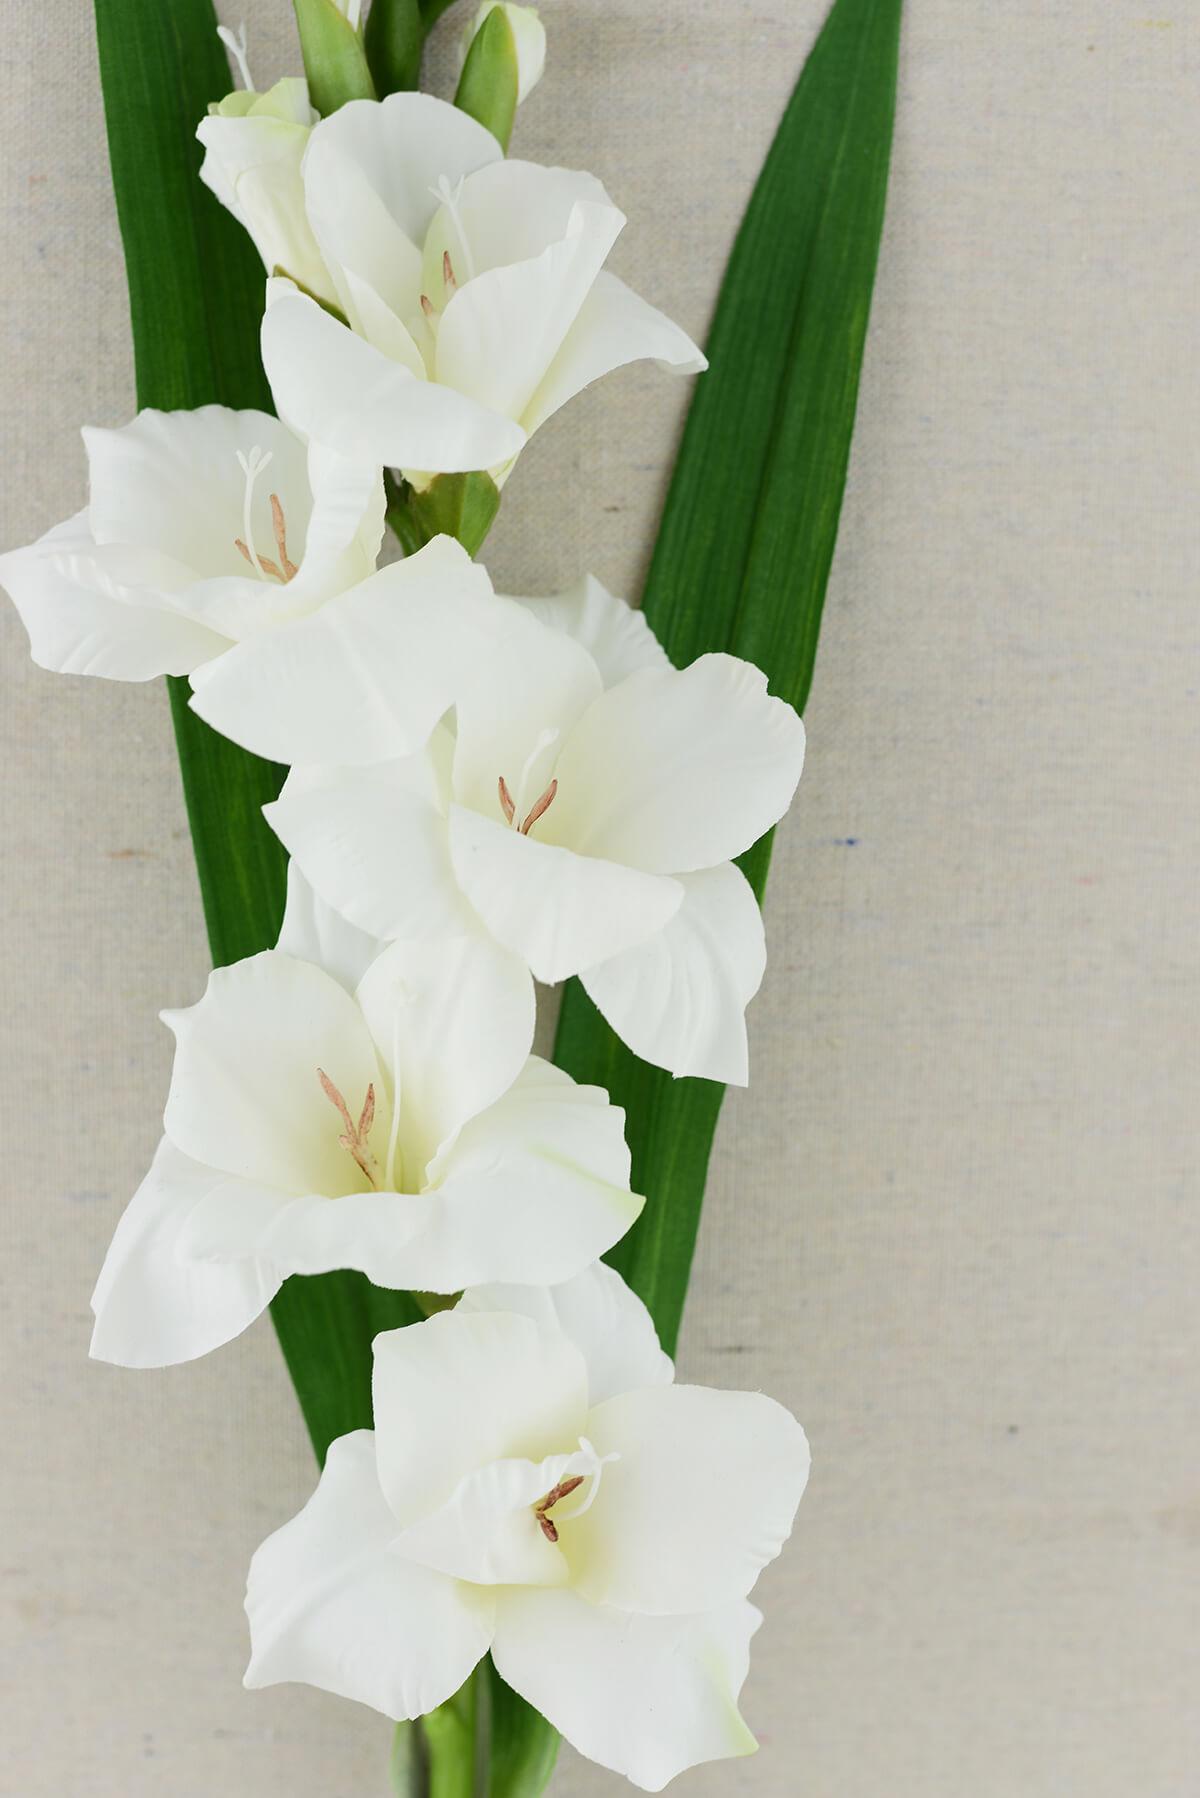 Gladiolus flower cream in